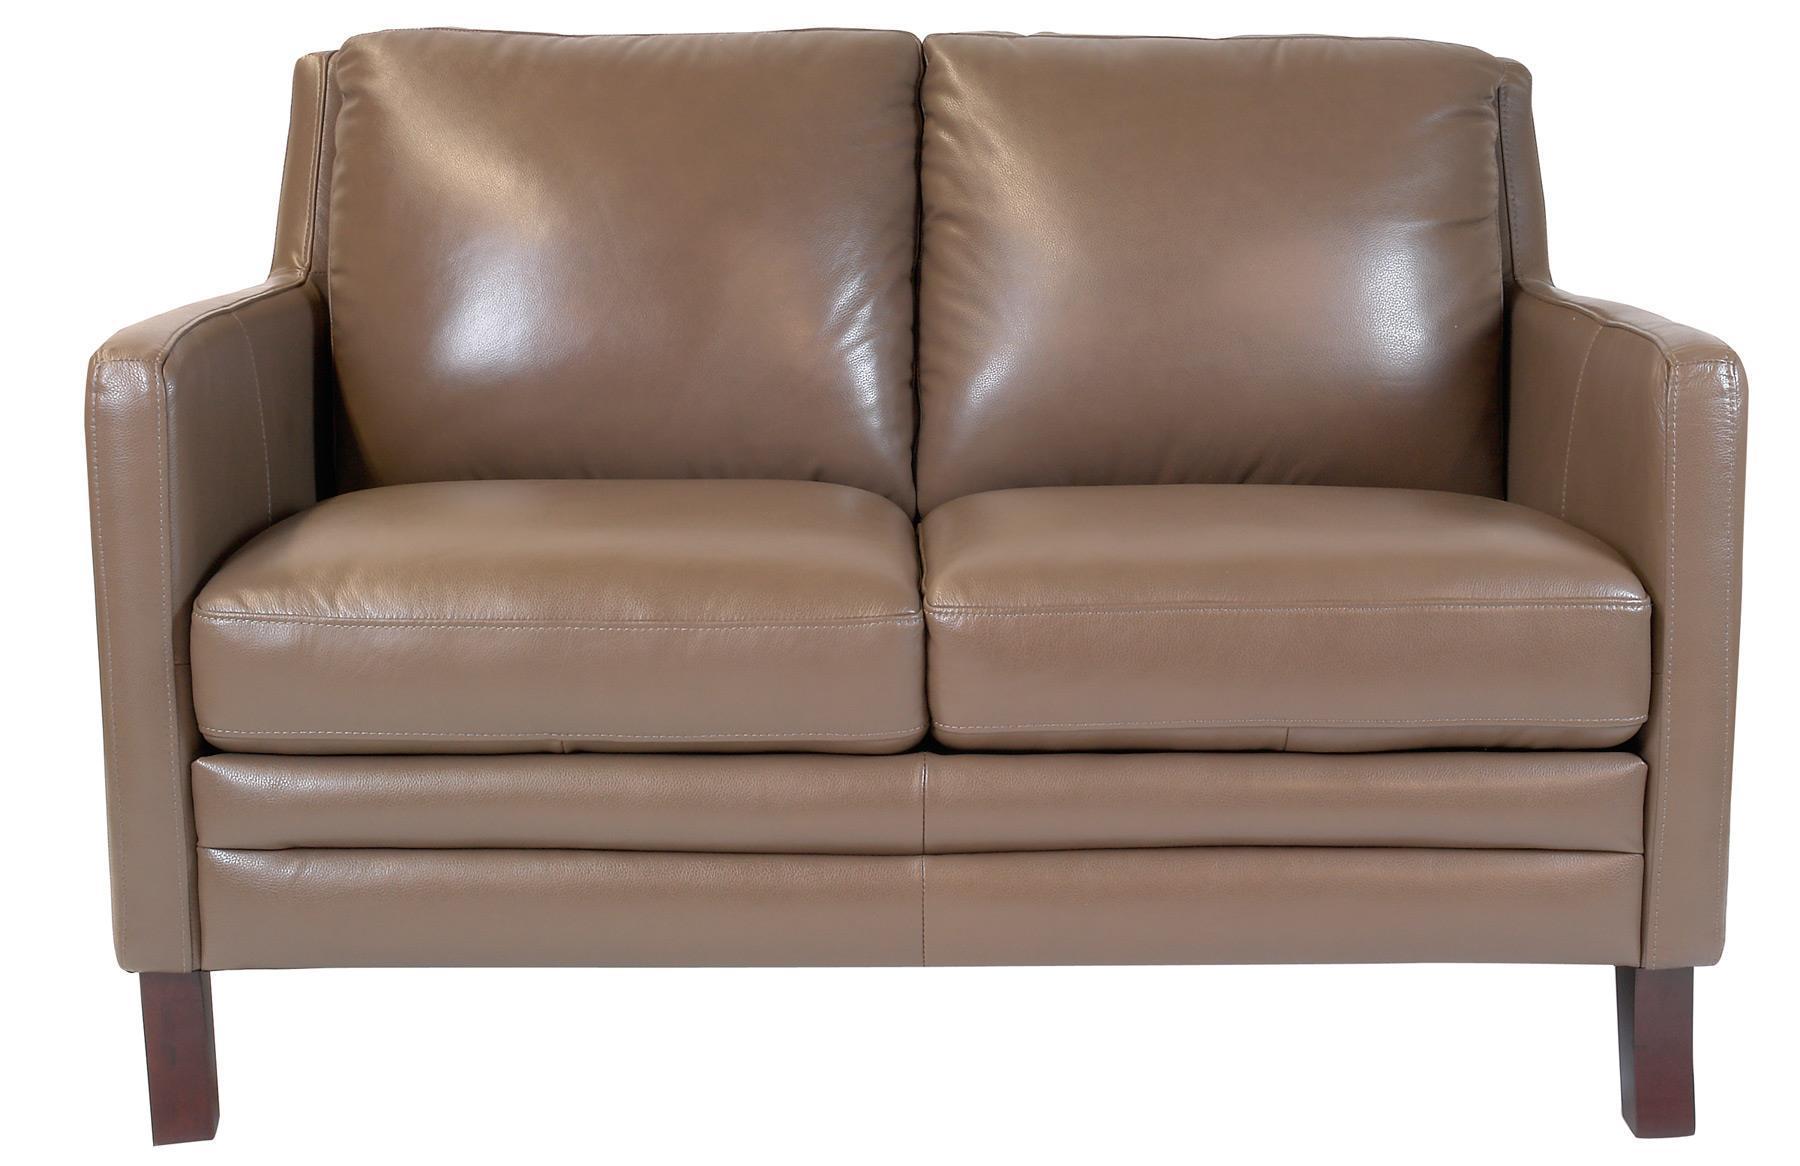 gallery regis collection beige tan furnishing loveseat format coco dreams furniture noel